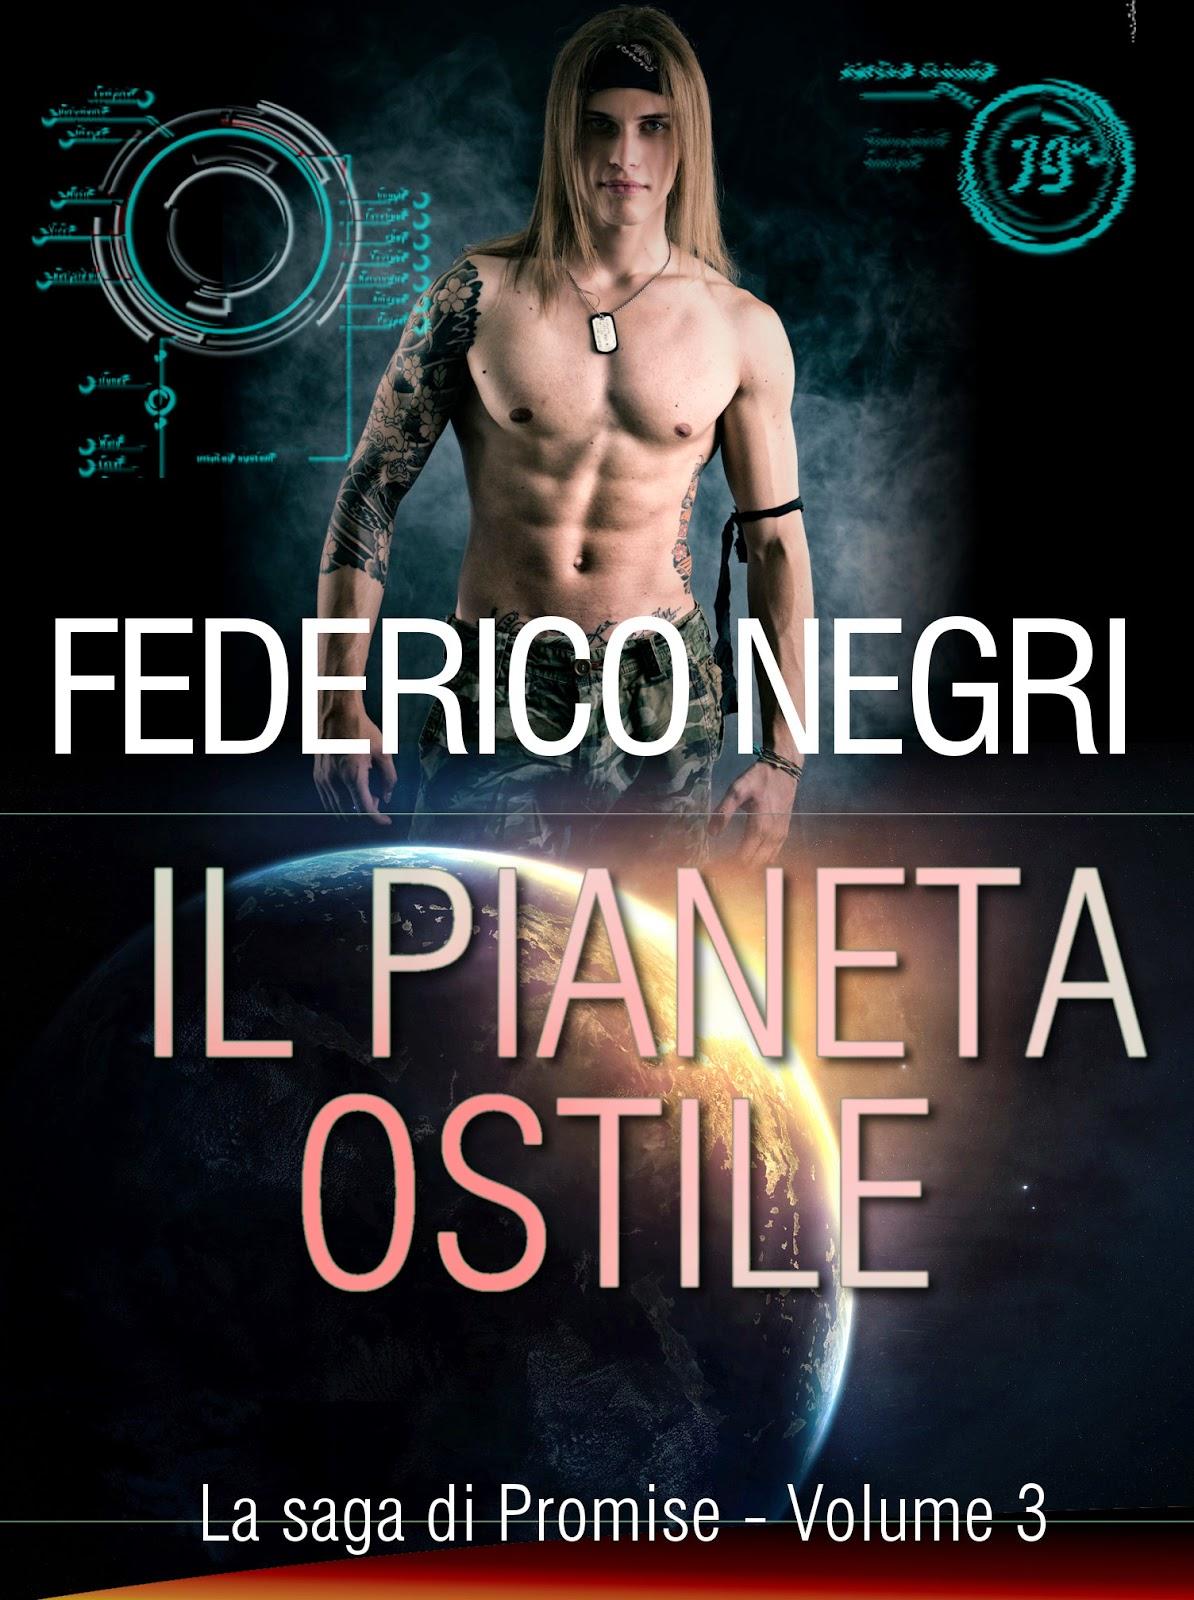 http://www.amazon.it/pianeta-ostile-saga-Promise-Vol-ebook/dp/B00KYUAYS4